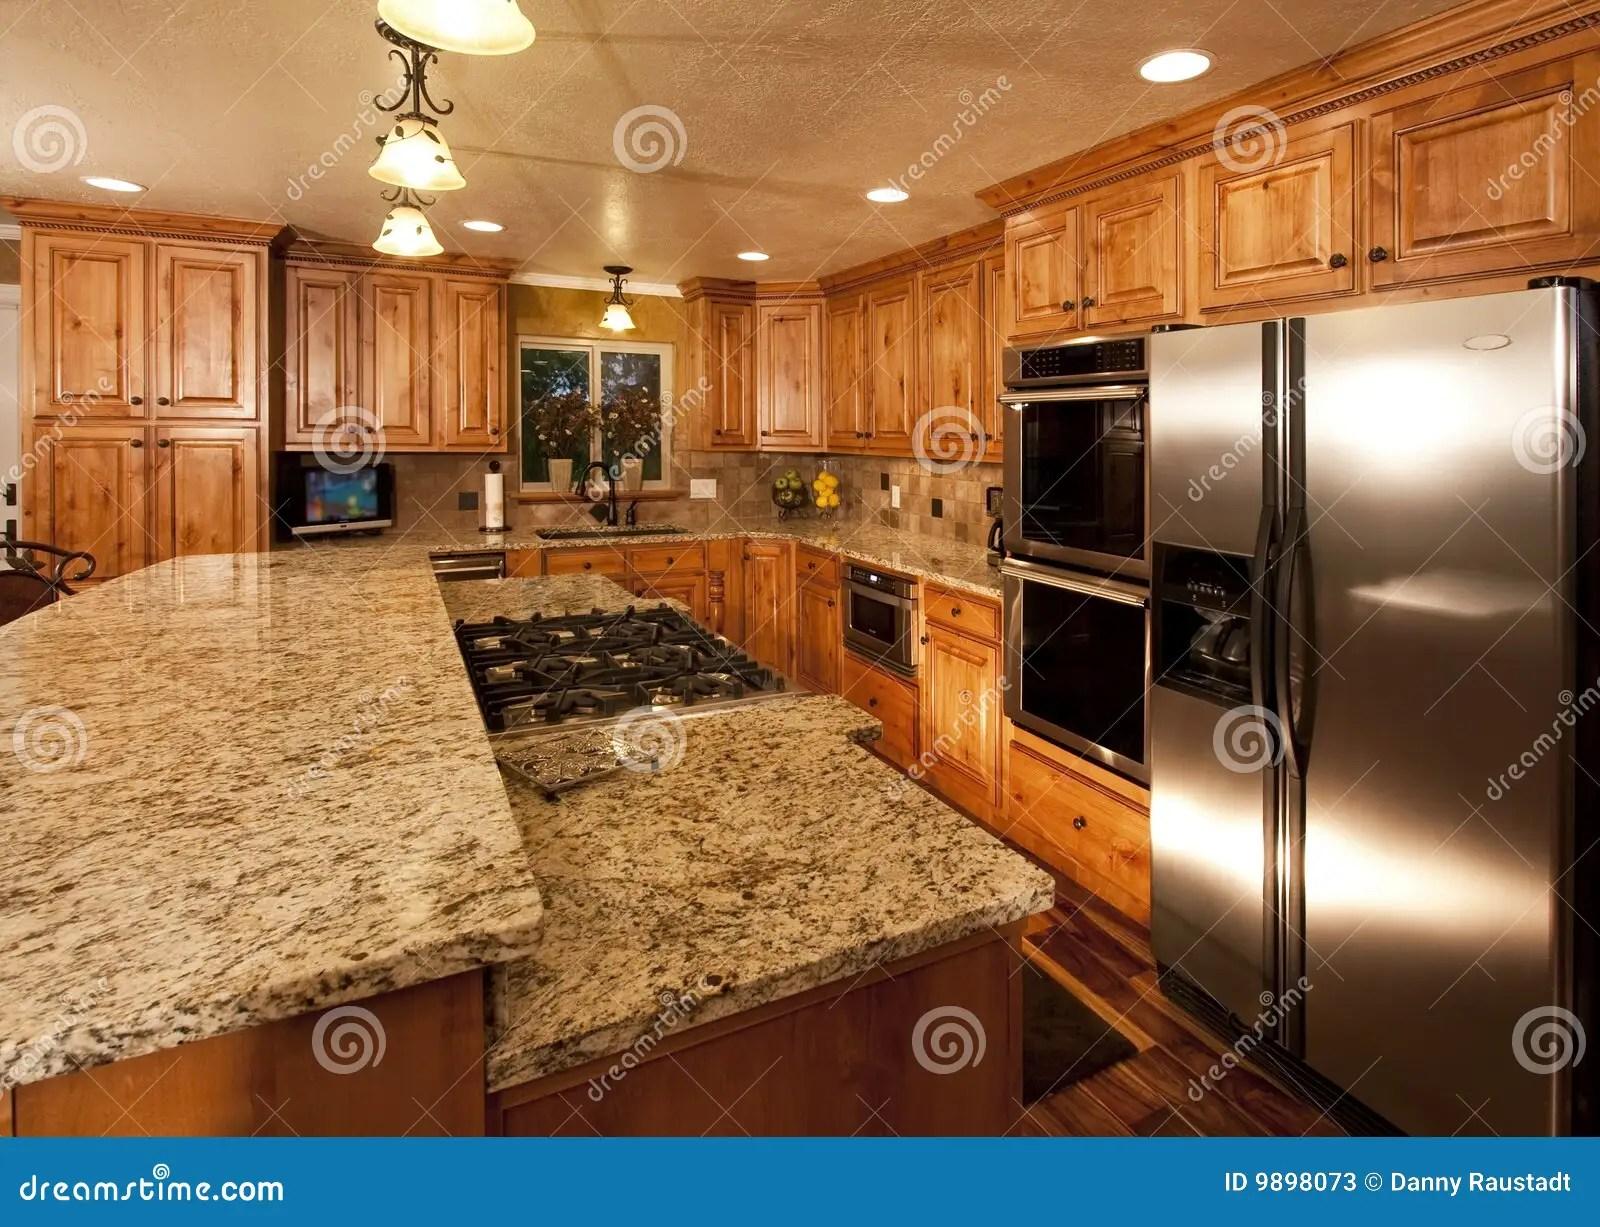 New Kitchen Island Stock Photos Image 9898073